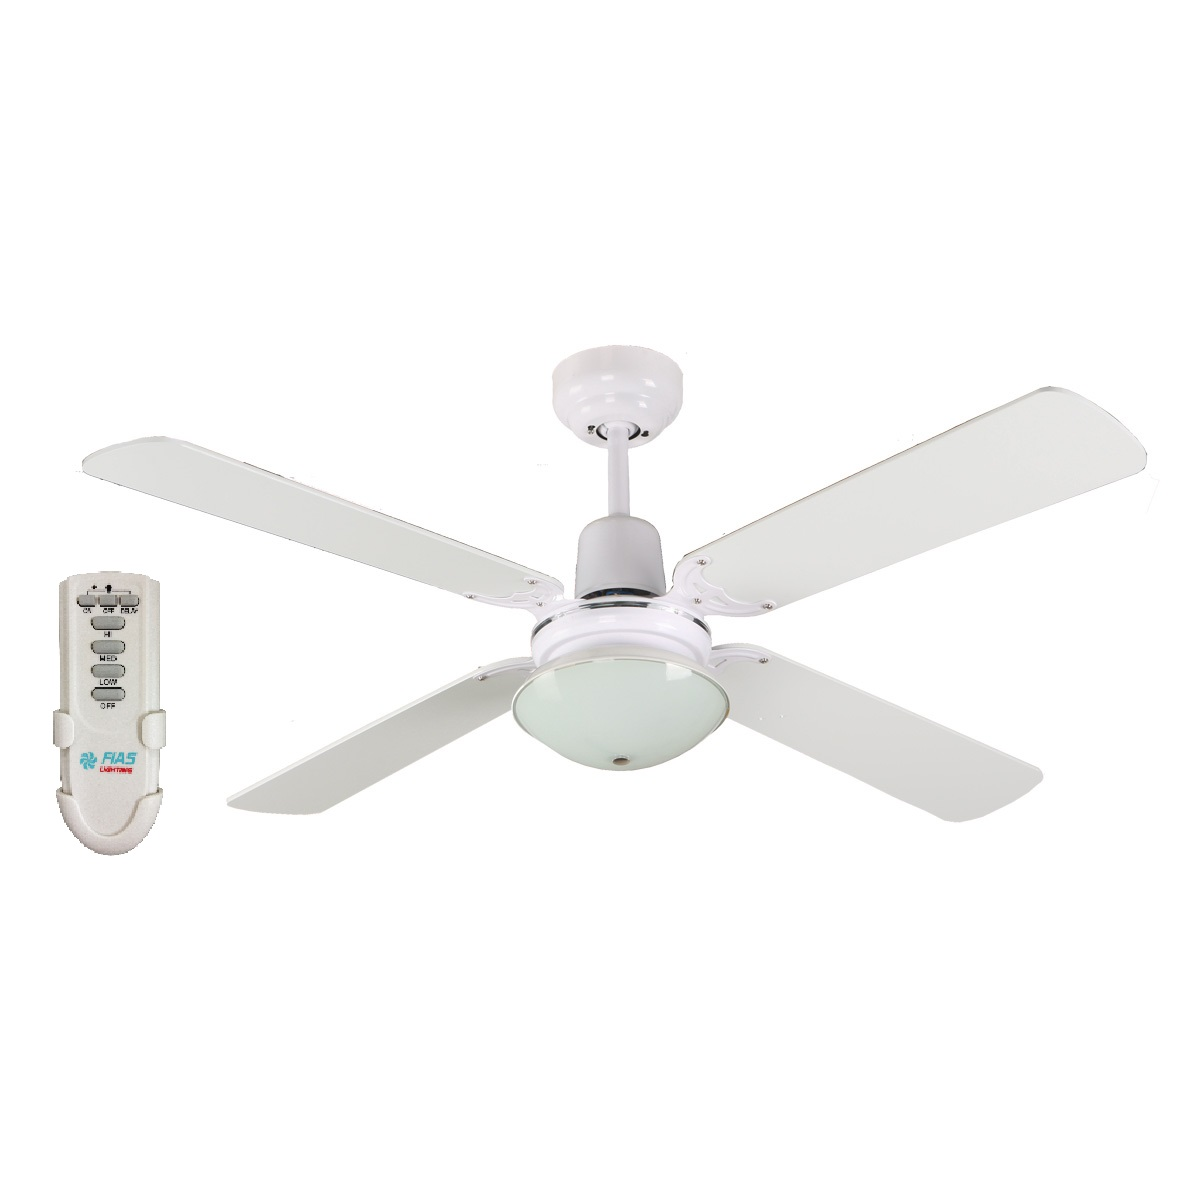 Budget Ceiling Fans | Ceiling Fan Bargains:Ramo 48'' Fan Light Remote White - RAMO48WHT,Lighting